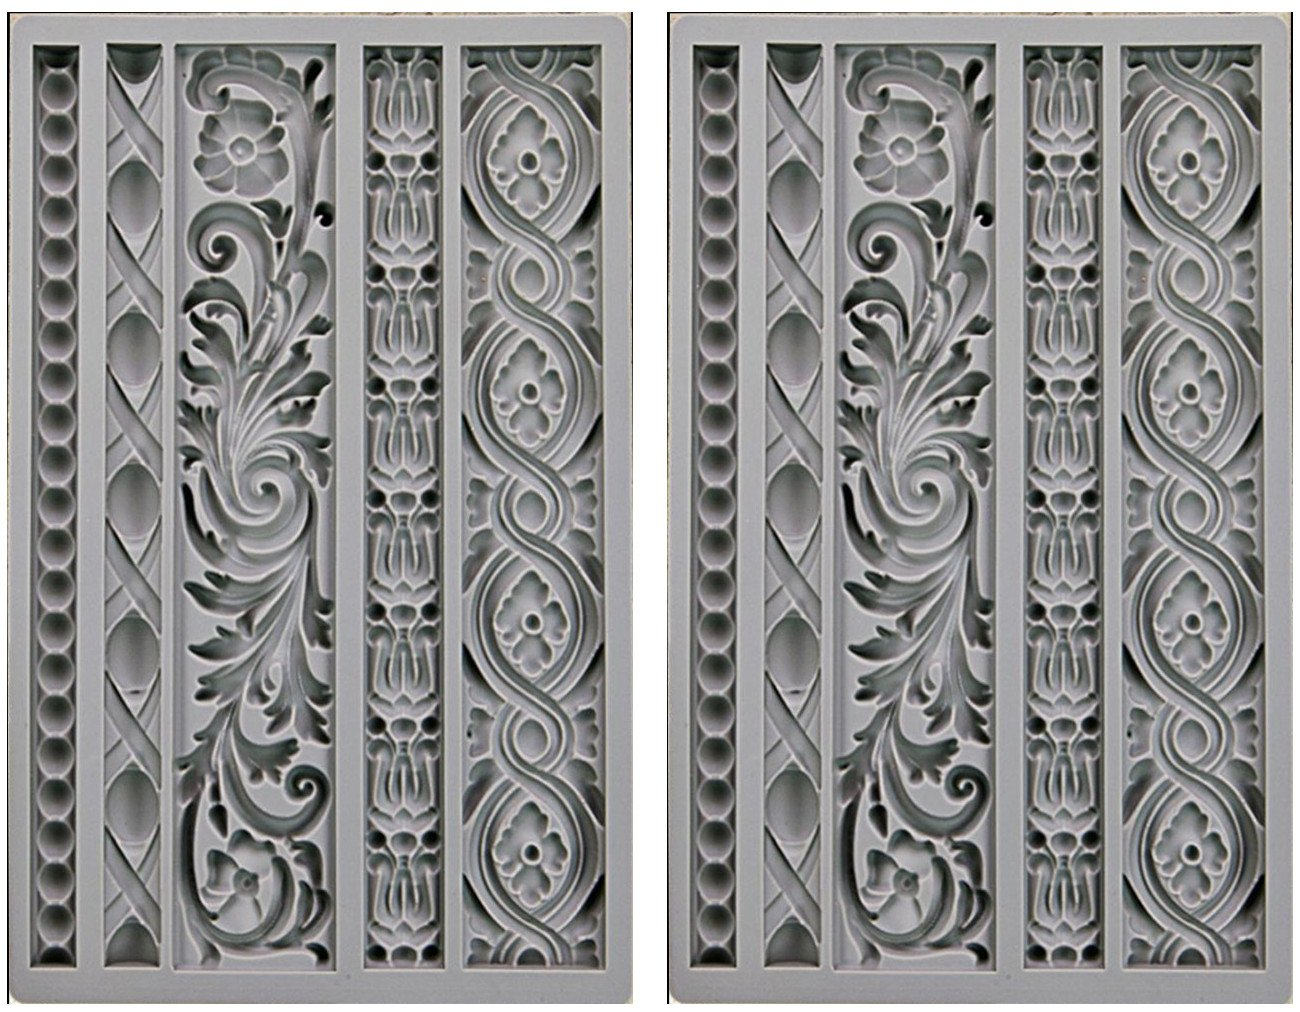 2-PACK - Prima Marketing 655350815325 Iod Vintage Art Decor Moulds- Moulding 1 Iod Vintage Art Decor Moulds - Moulding 1 Prima Marketing Inc